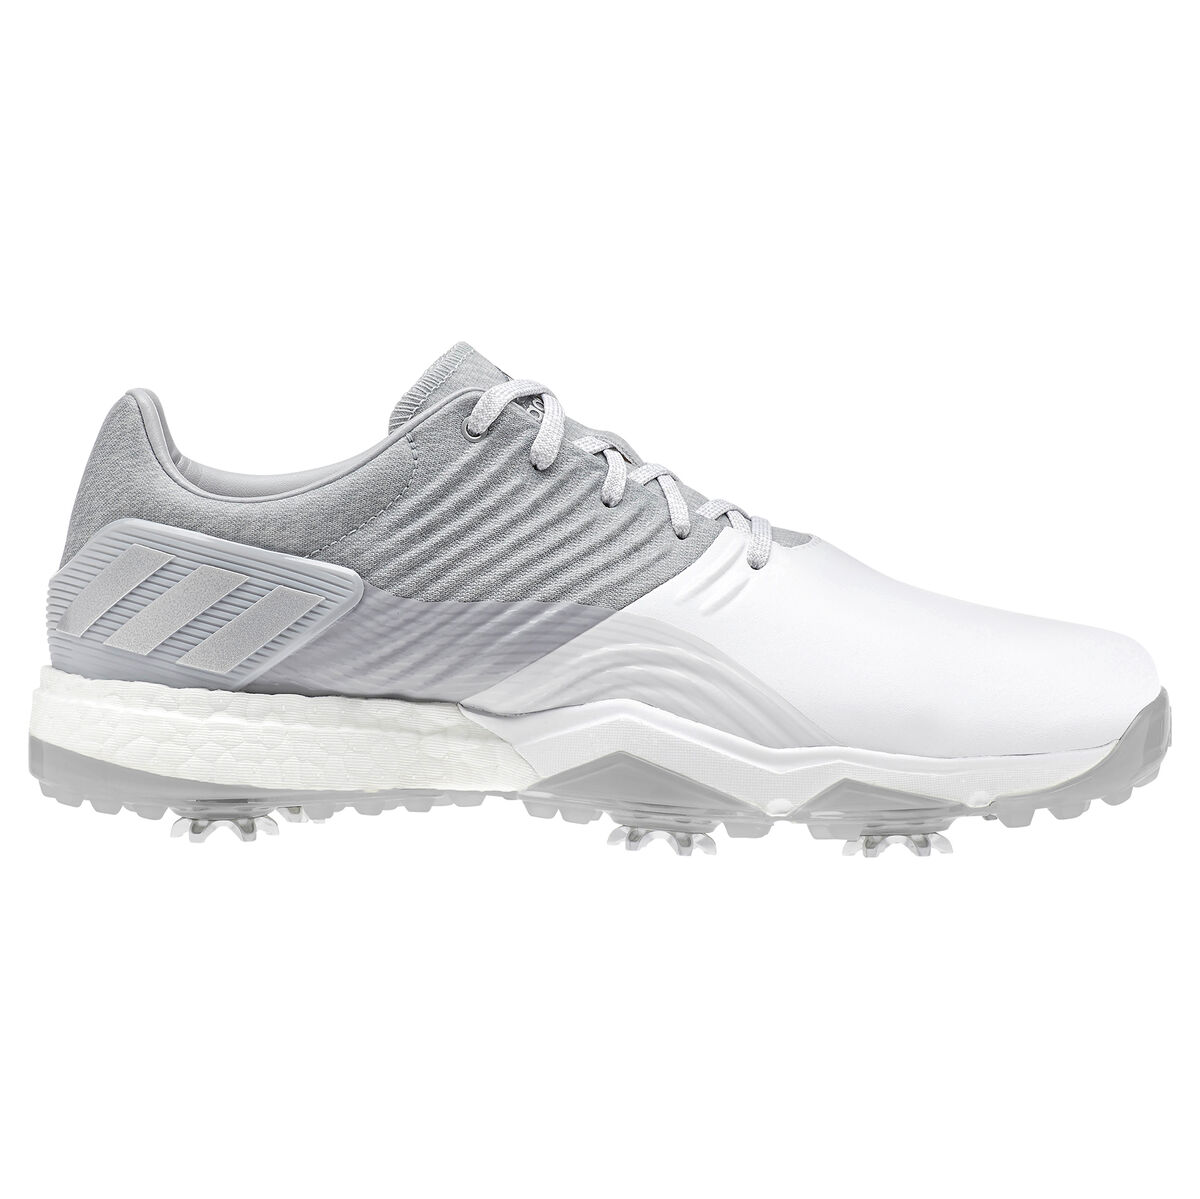 a34b2a56b2634 adidas adipower 4ORGED Men s Golf Shoe - Silver